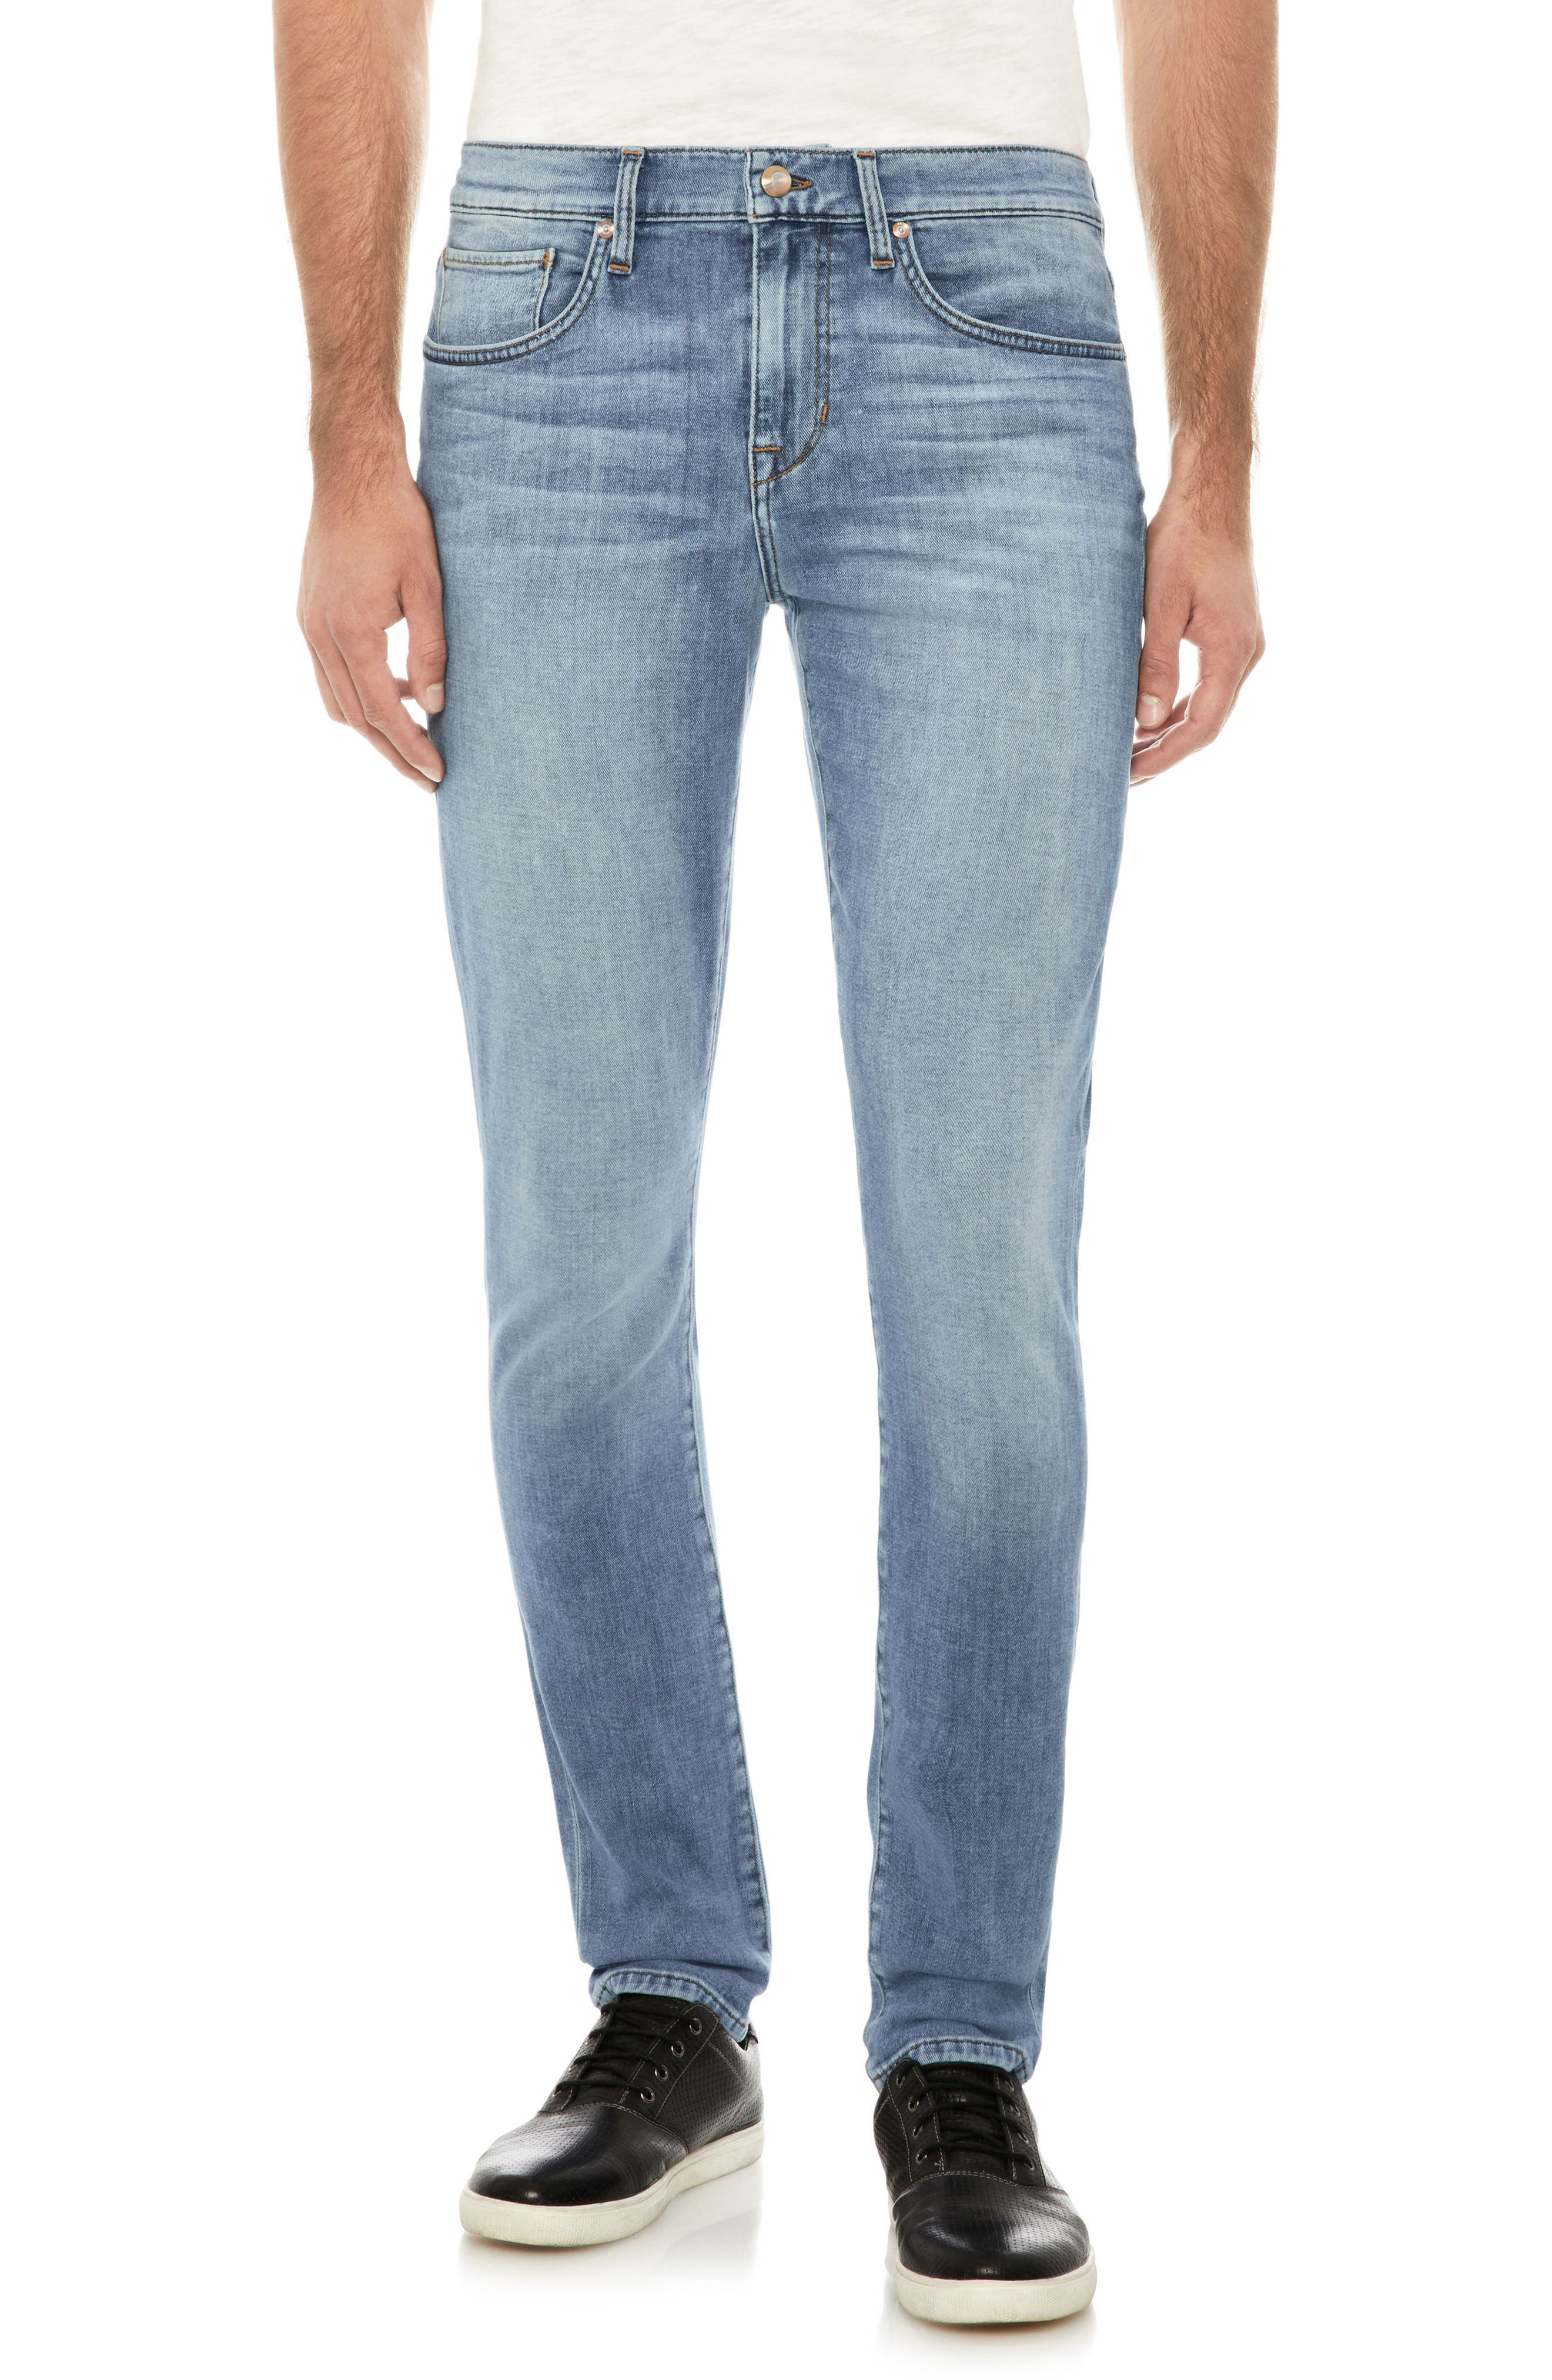 Legend Skinny Fit Jeans,                         Main,                         color,